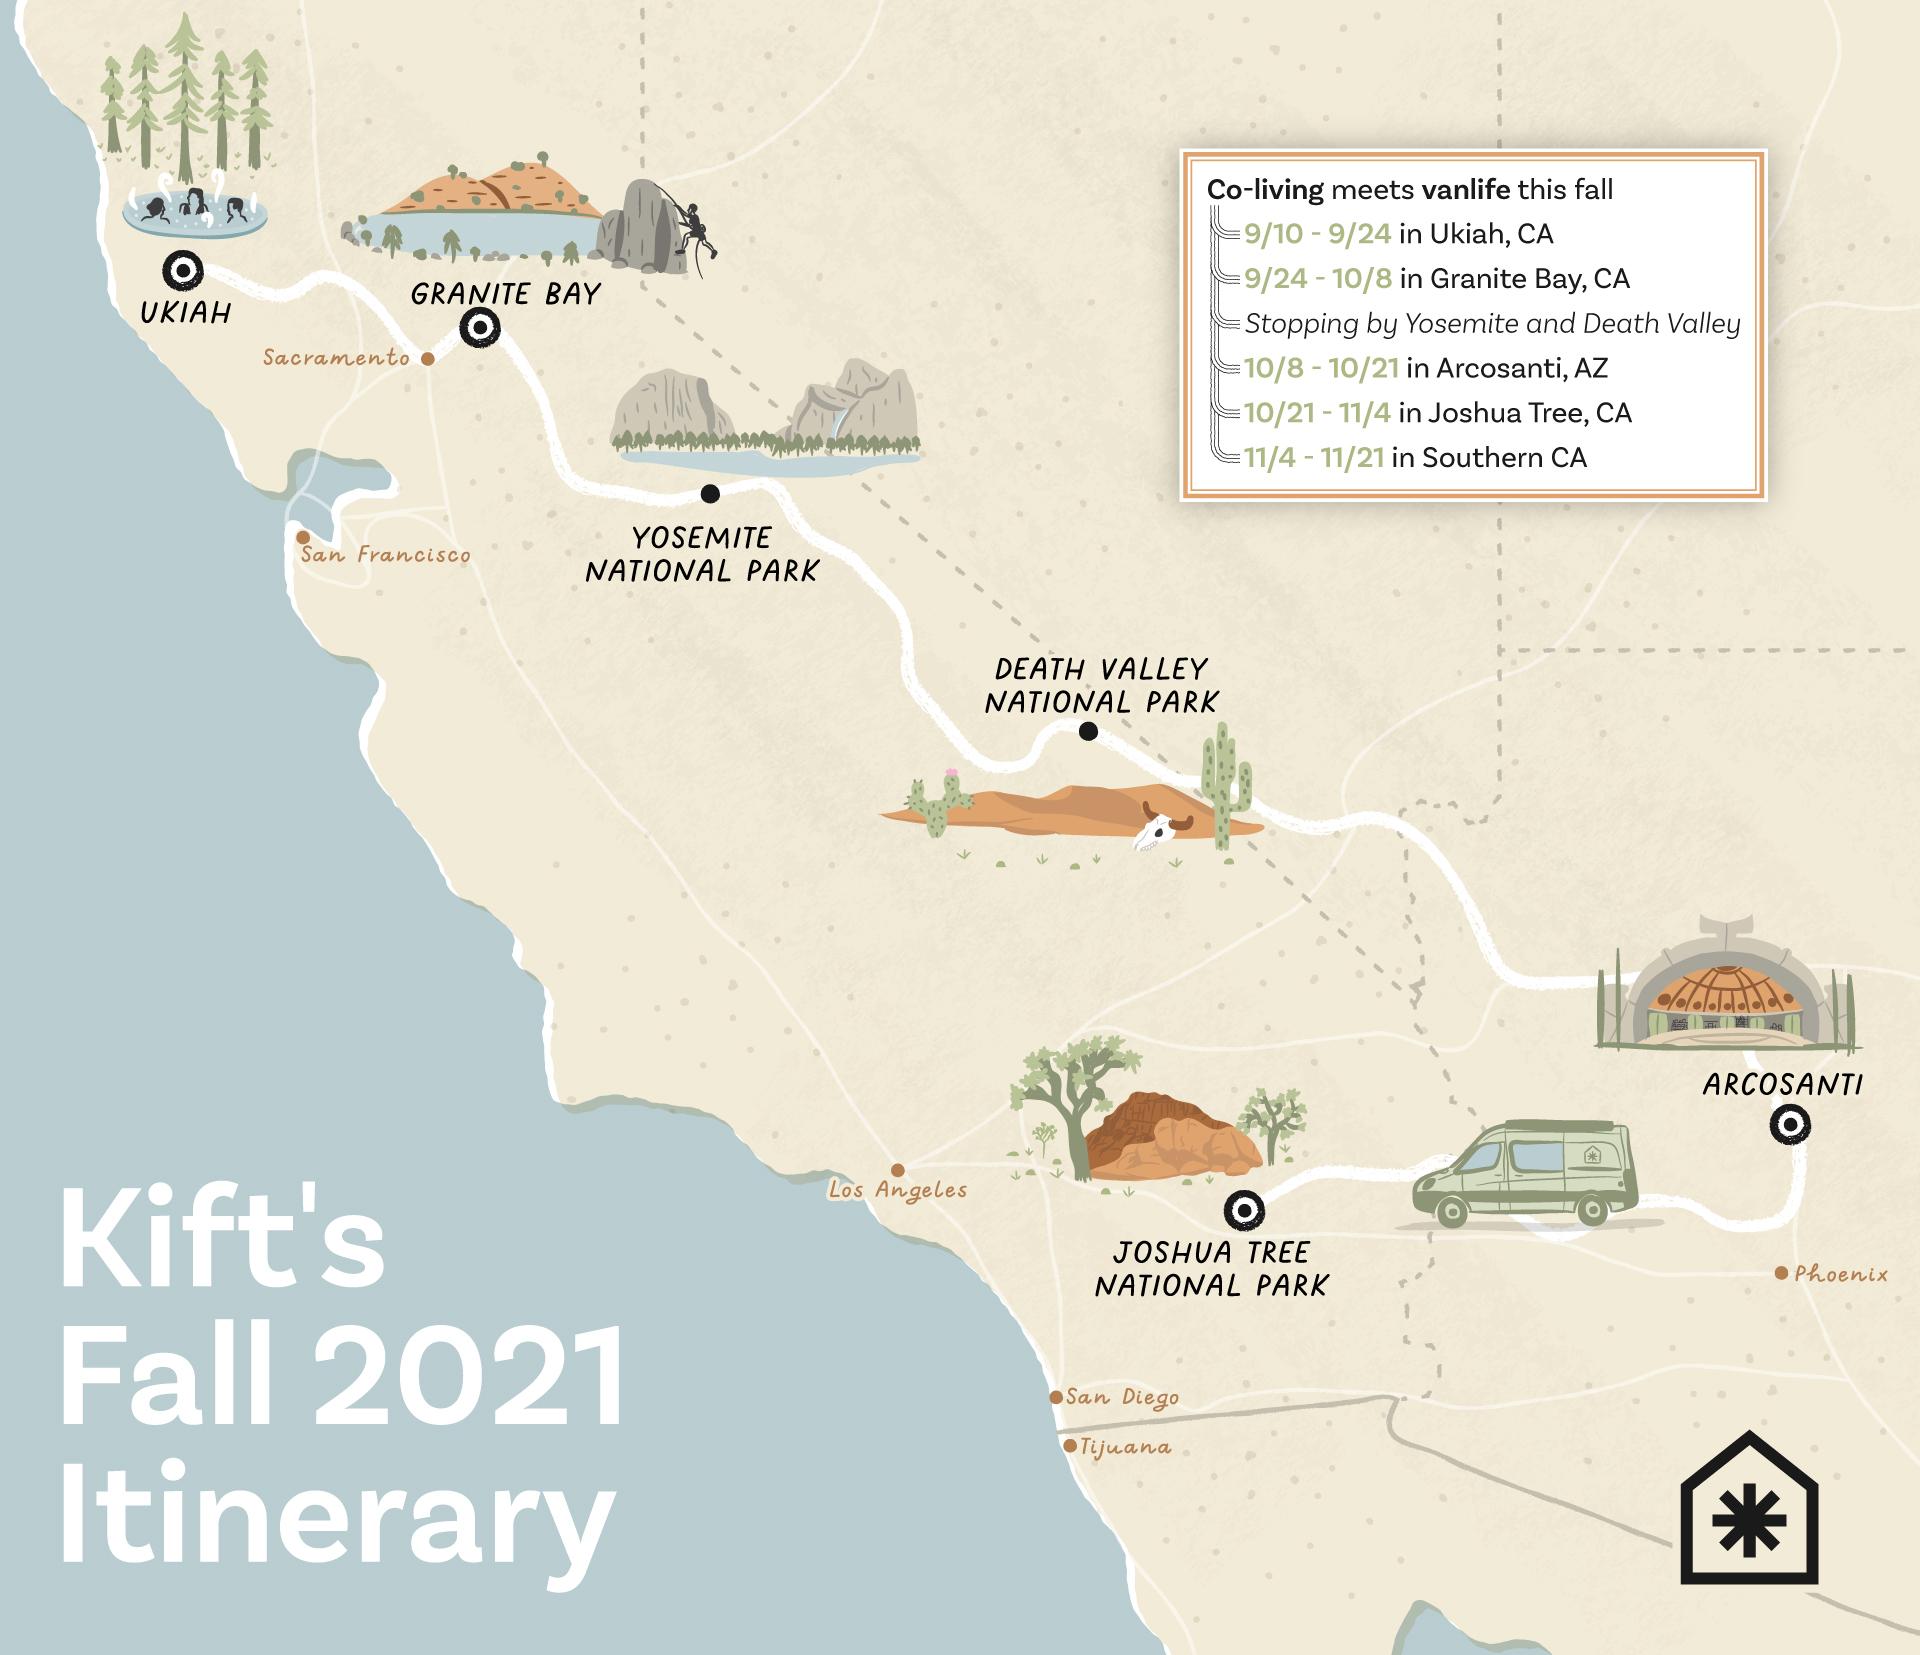 California to Arizona illustrated itinerary map